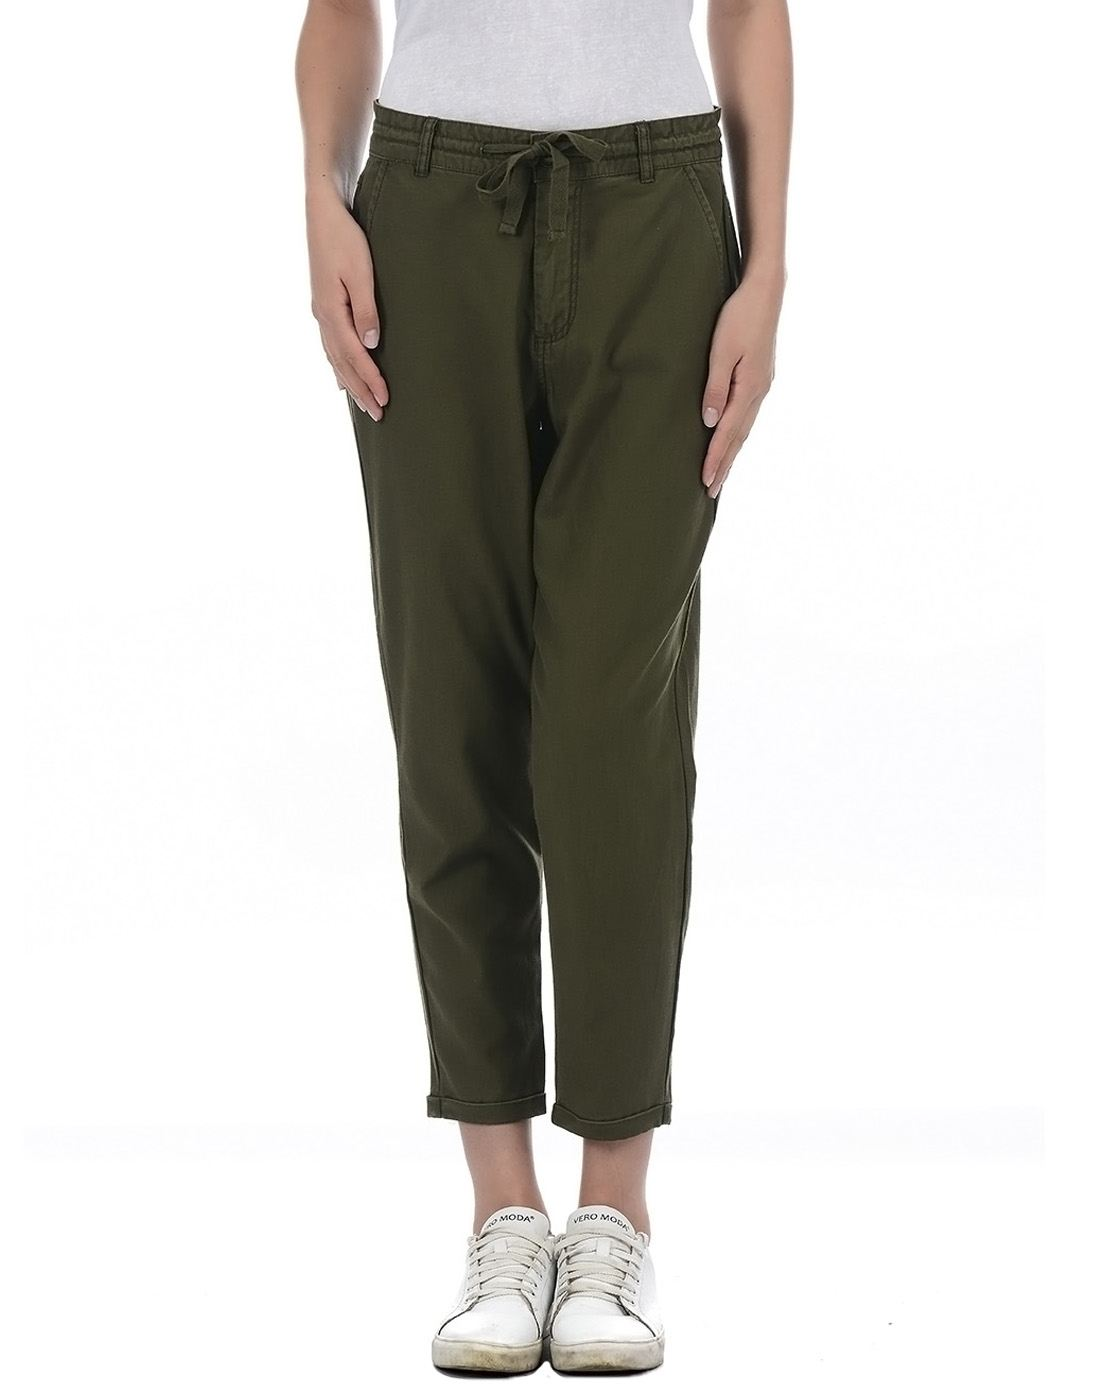 Only Women Casual Green Trouser